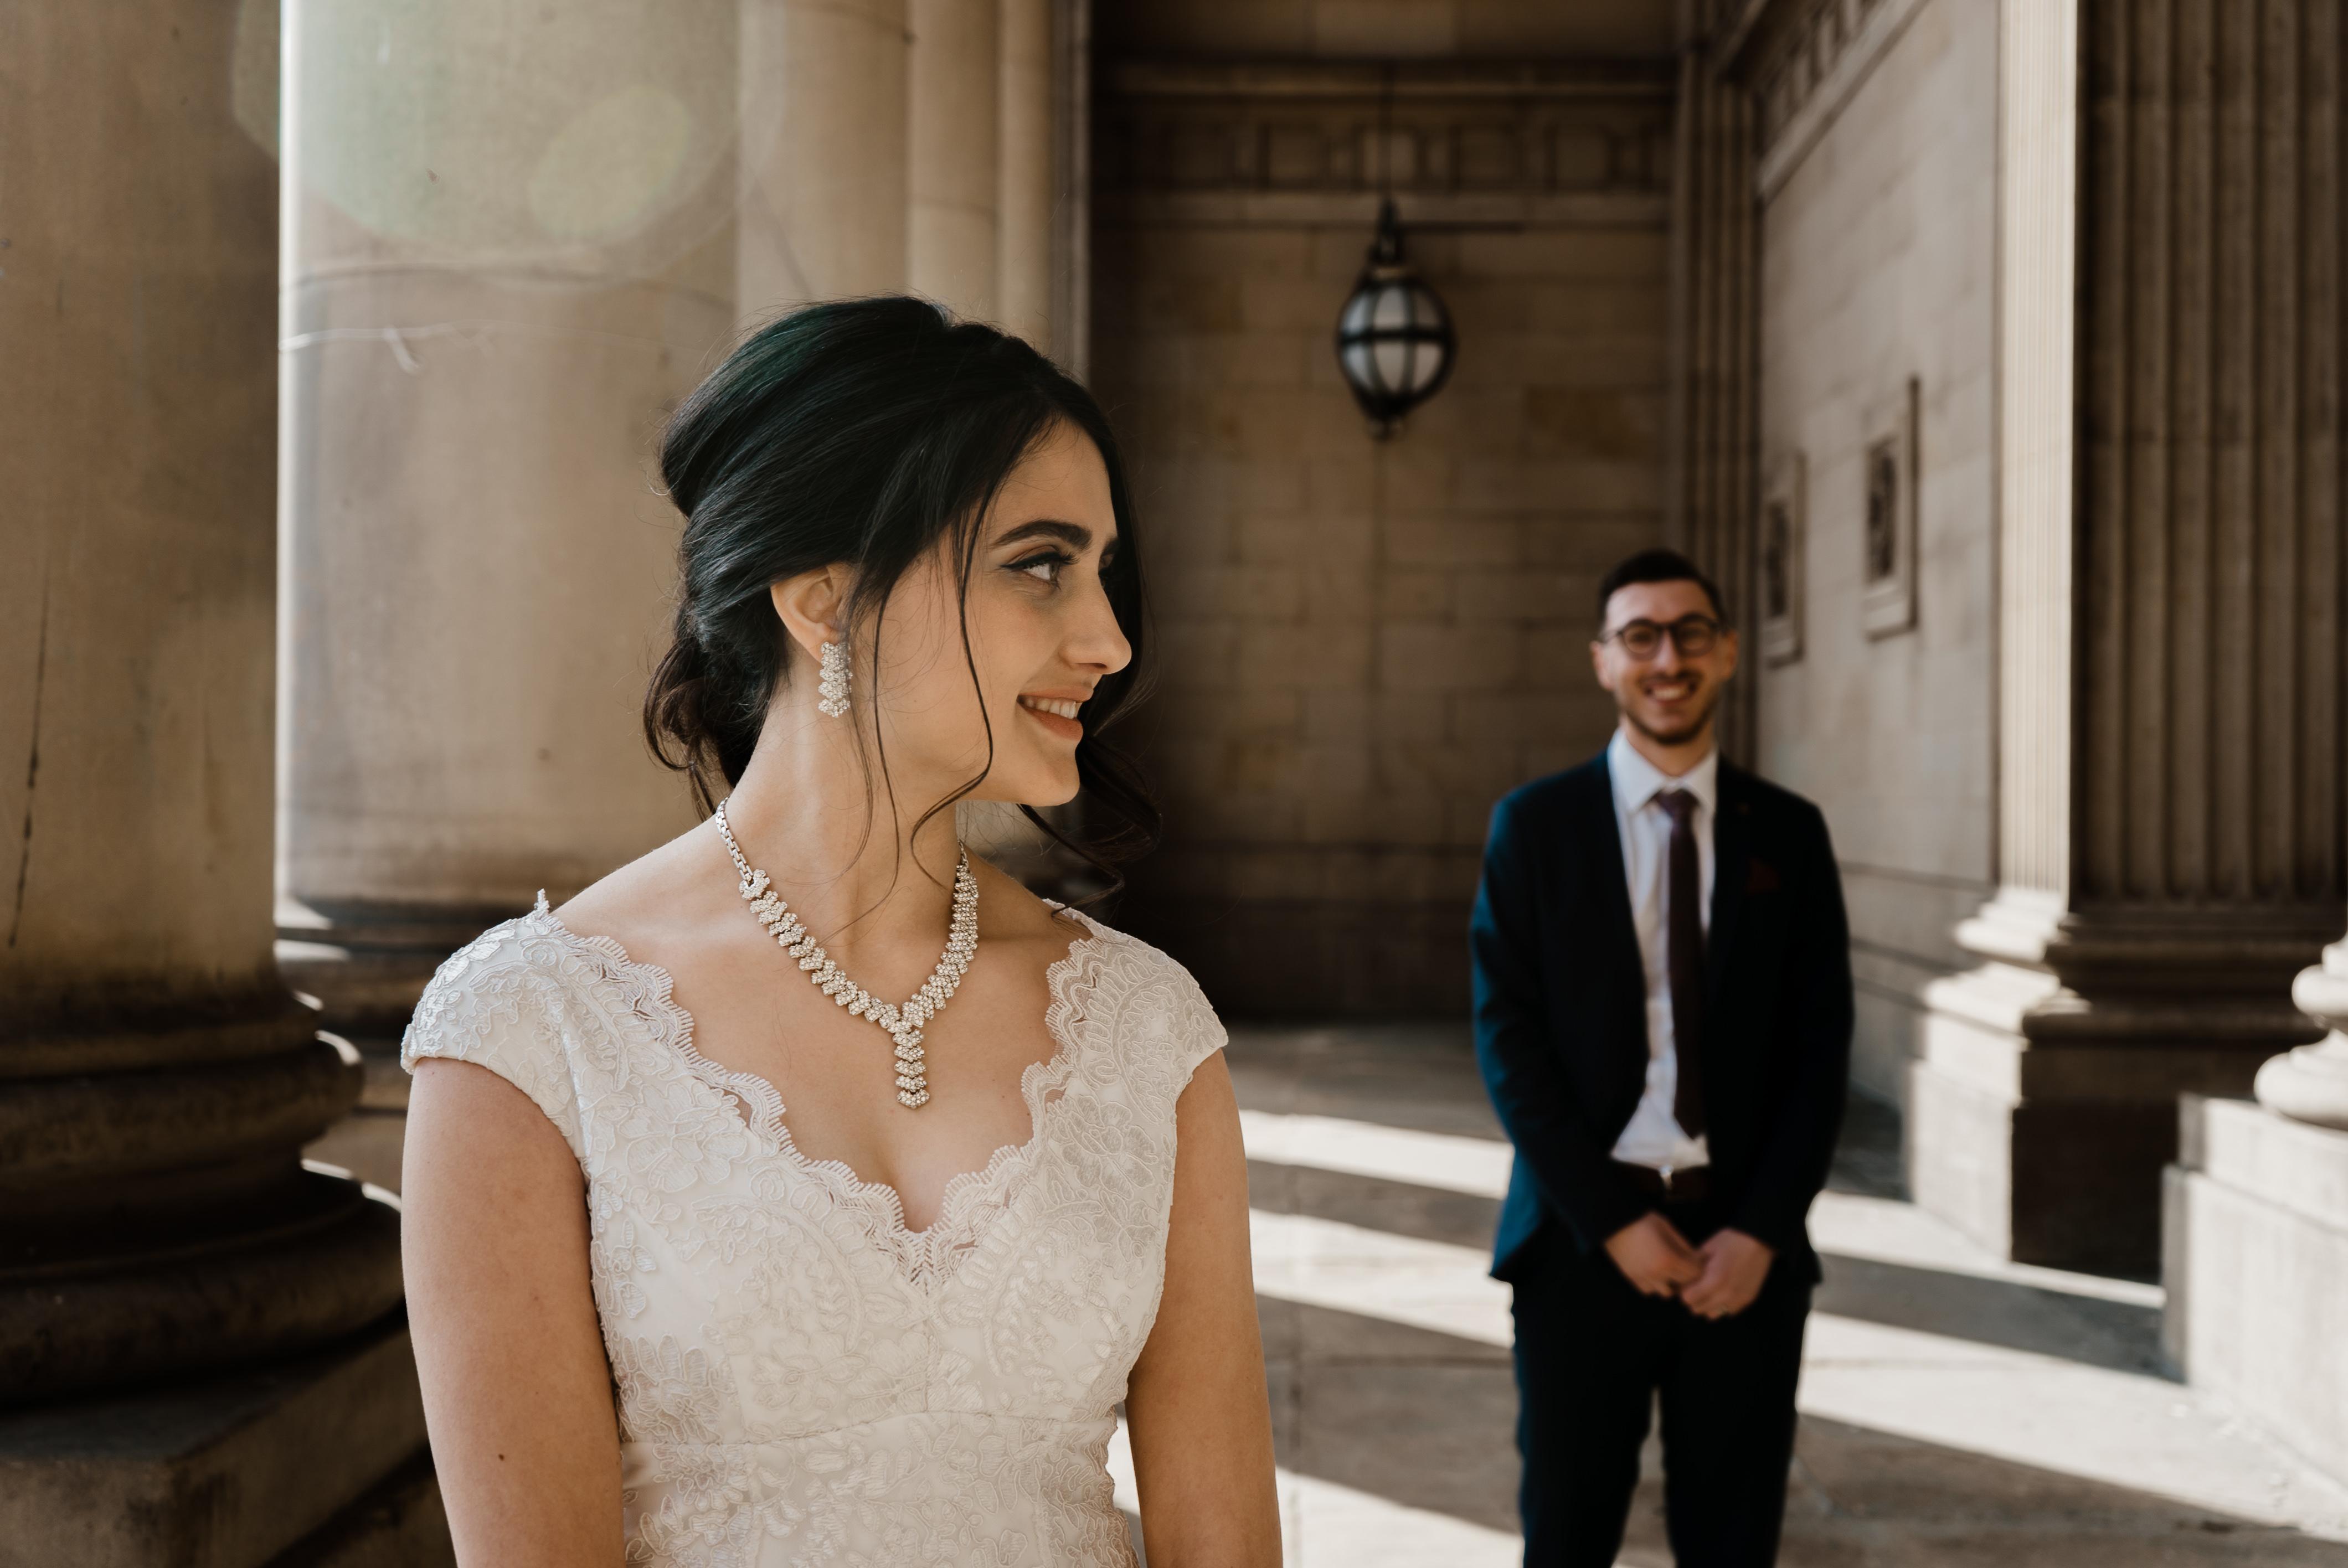 Top wedding photographers leeds